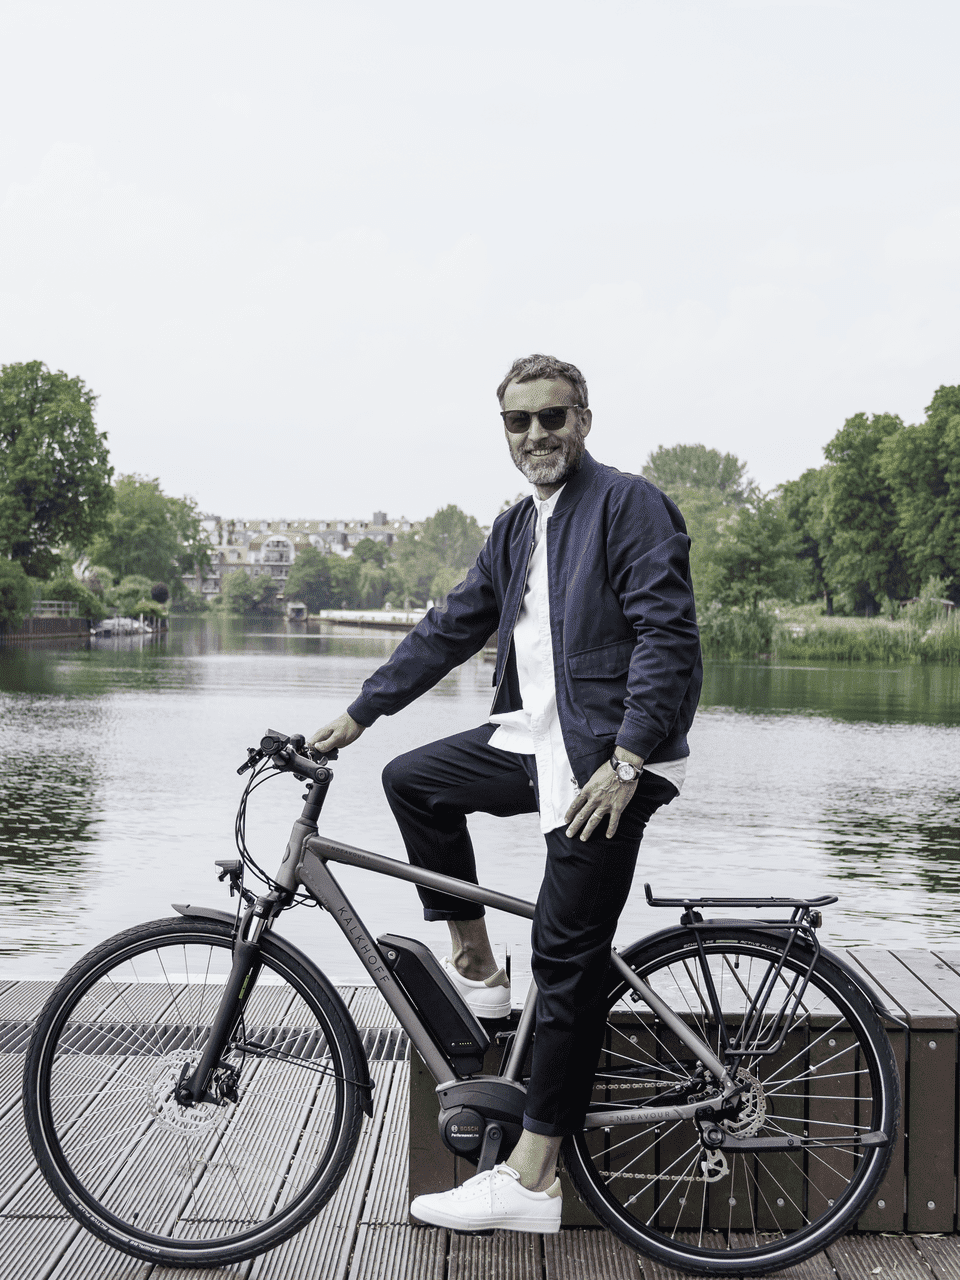 Prijsvoorbeeld lease a bike